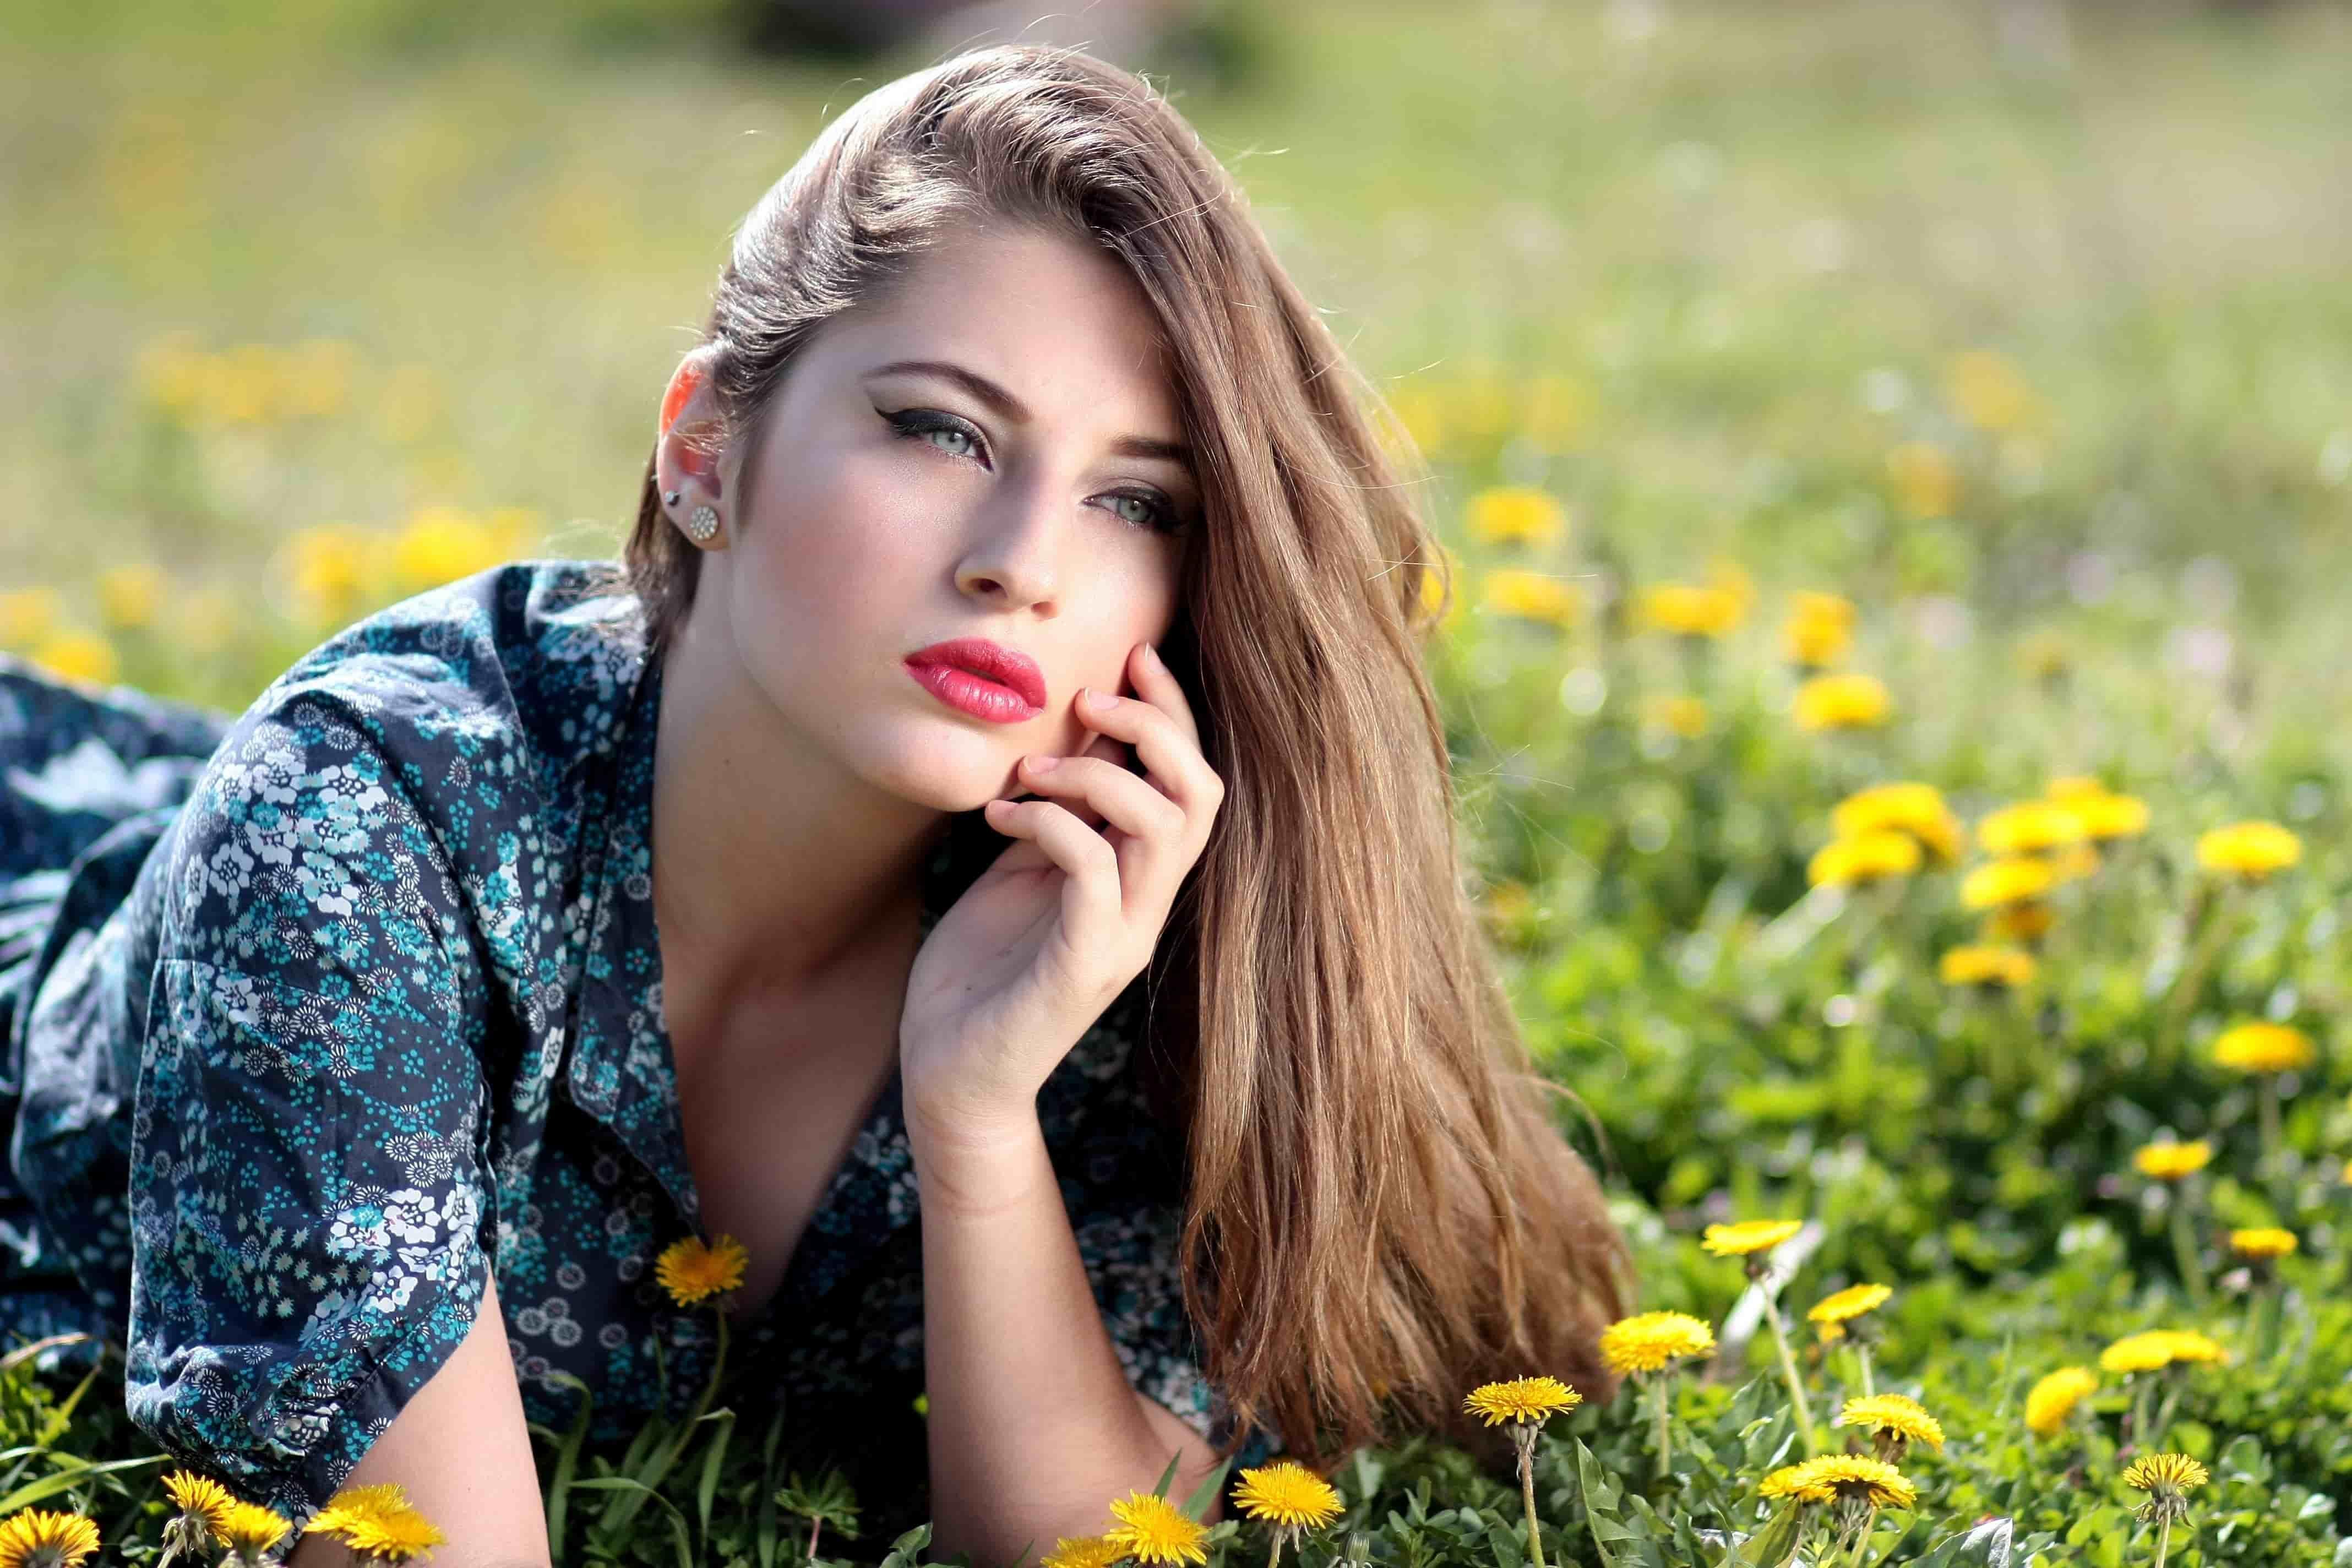 are single sinsheim topic, interesting me))))